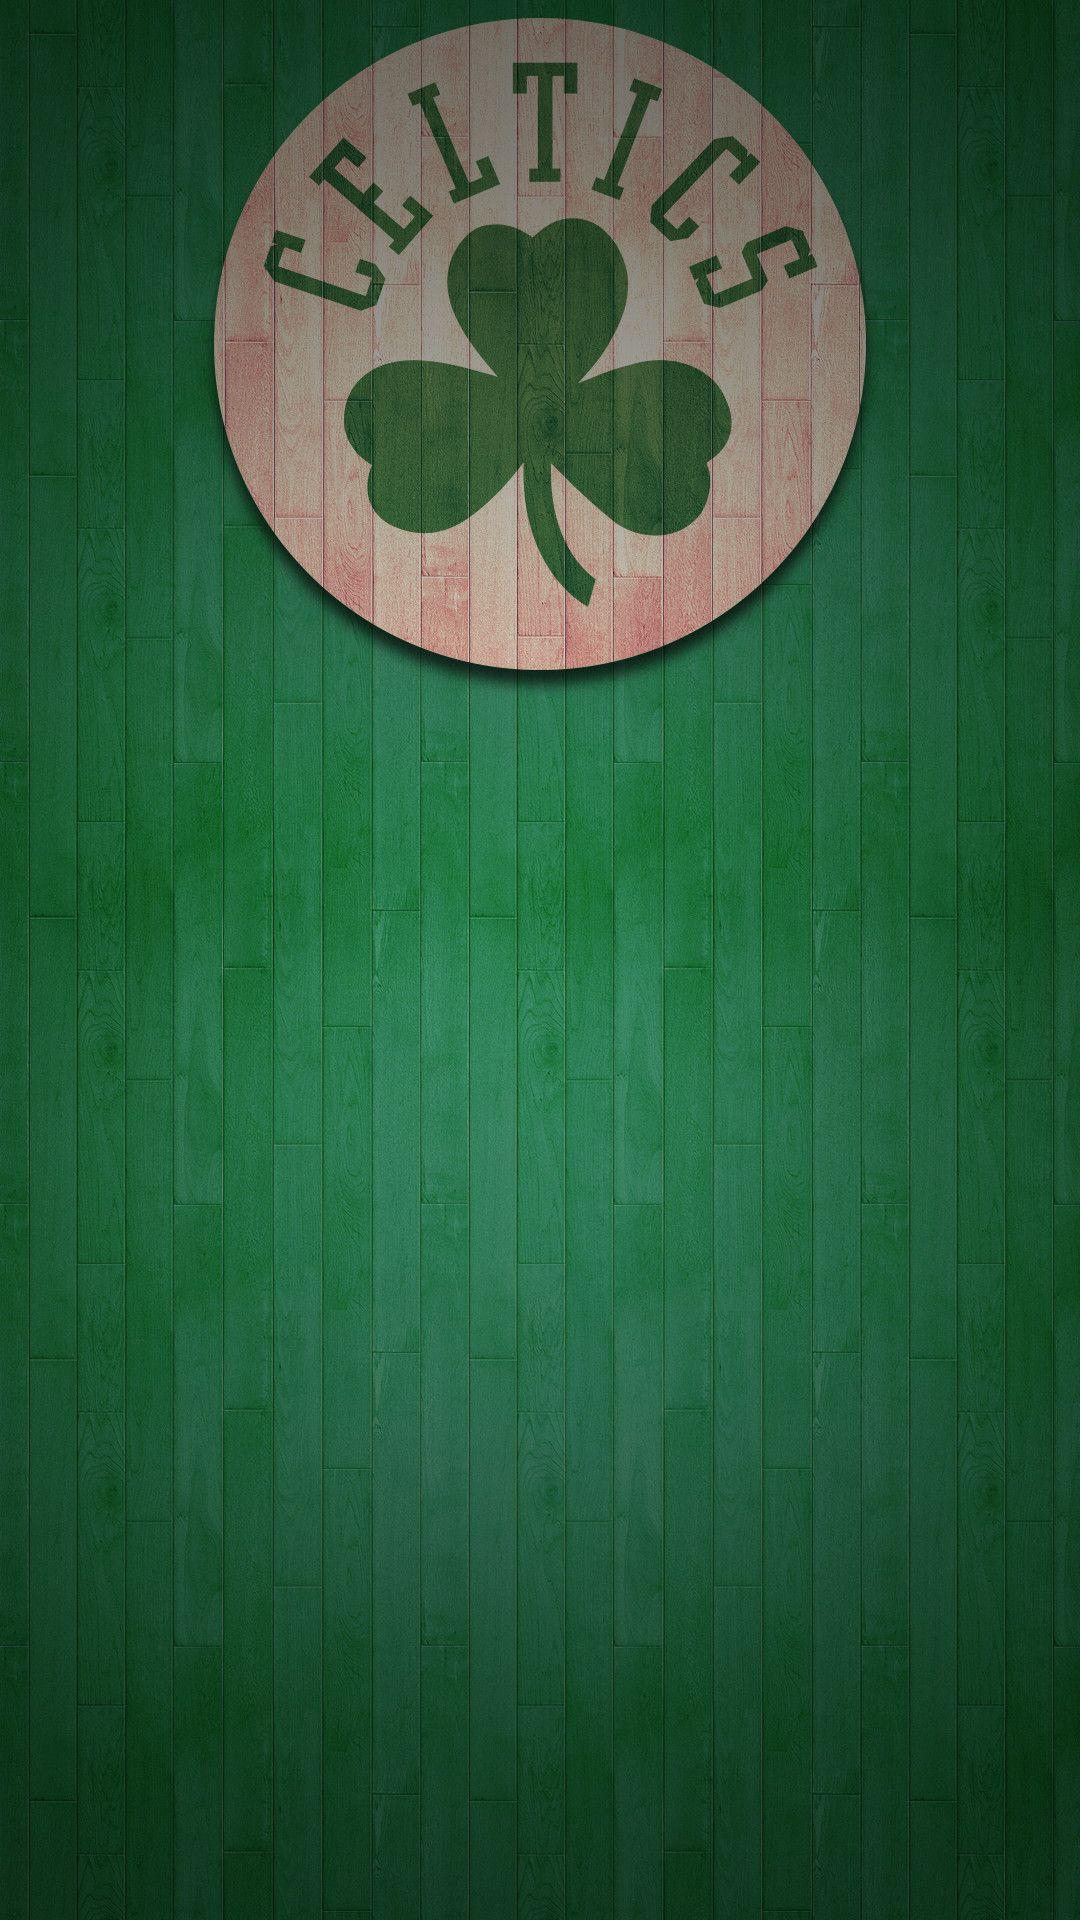 1080x1920 Boston Celtics 2017 Mobile Home Screen Wallpaper For Iphone Android Pixel Boston Celtics Wallpaper Boston Wallpaper Boston Celtics